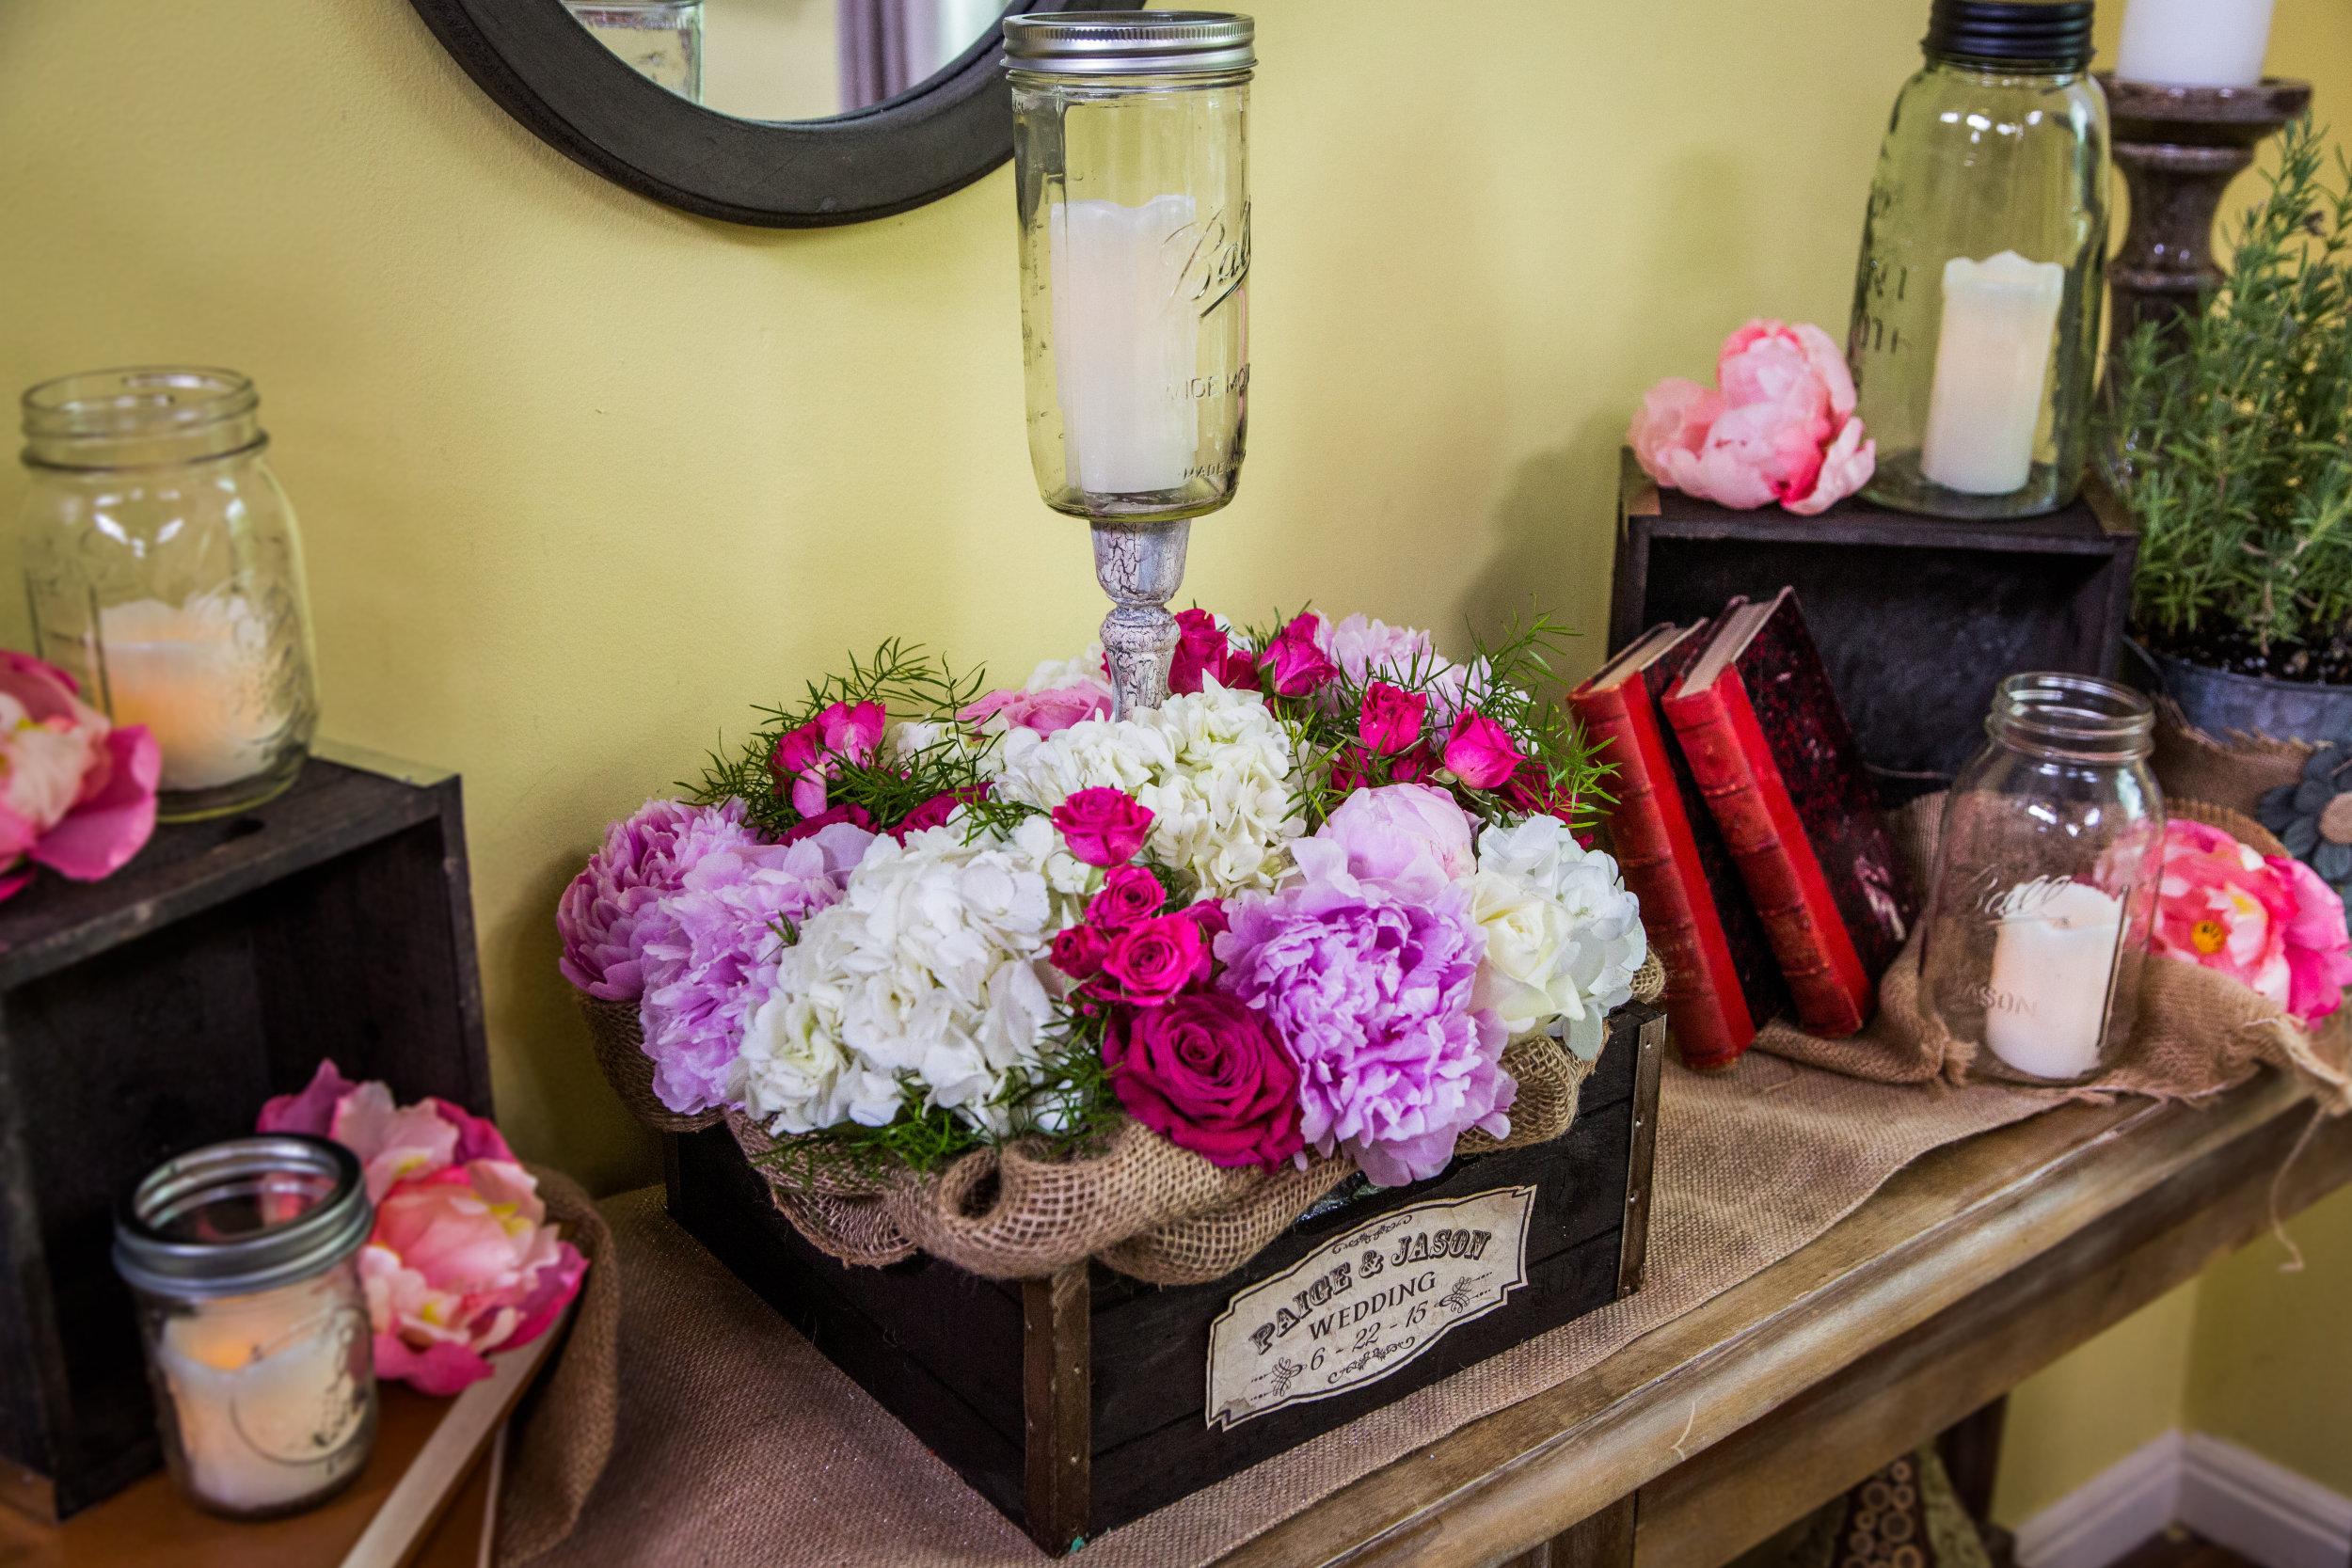 Paige's DIY Flower Wedding Centerpieces